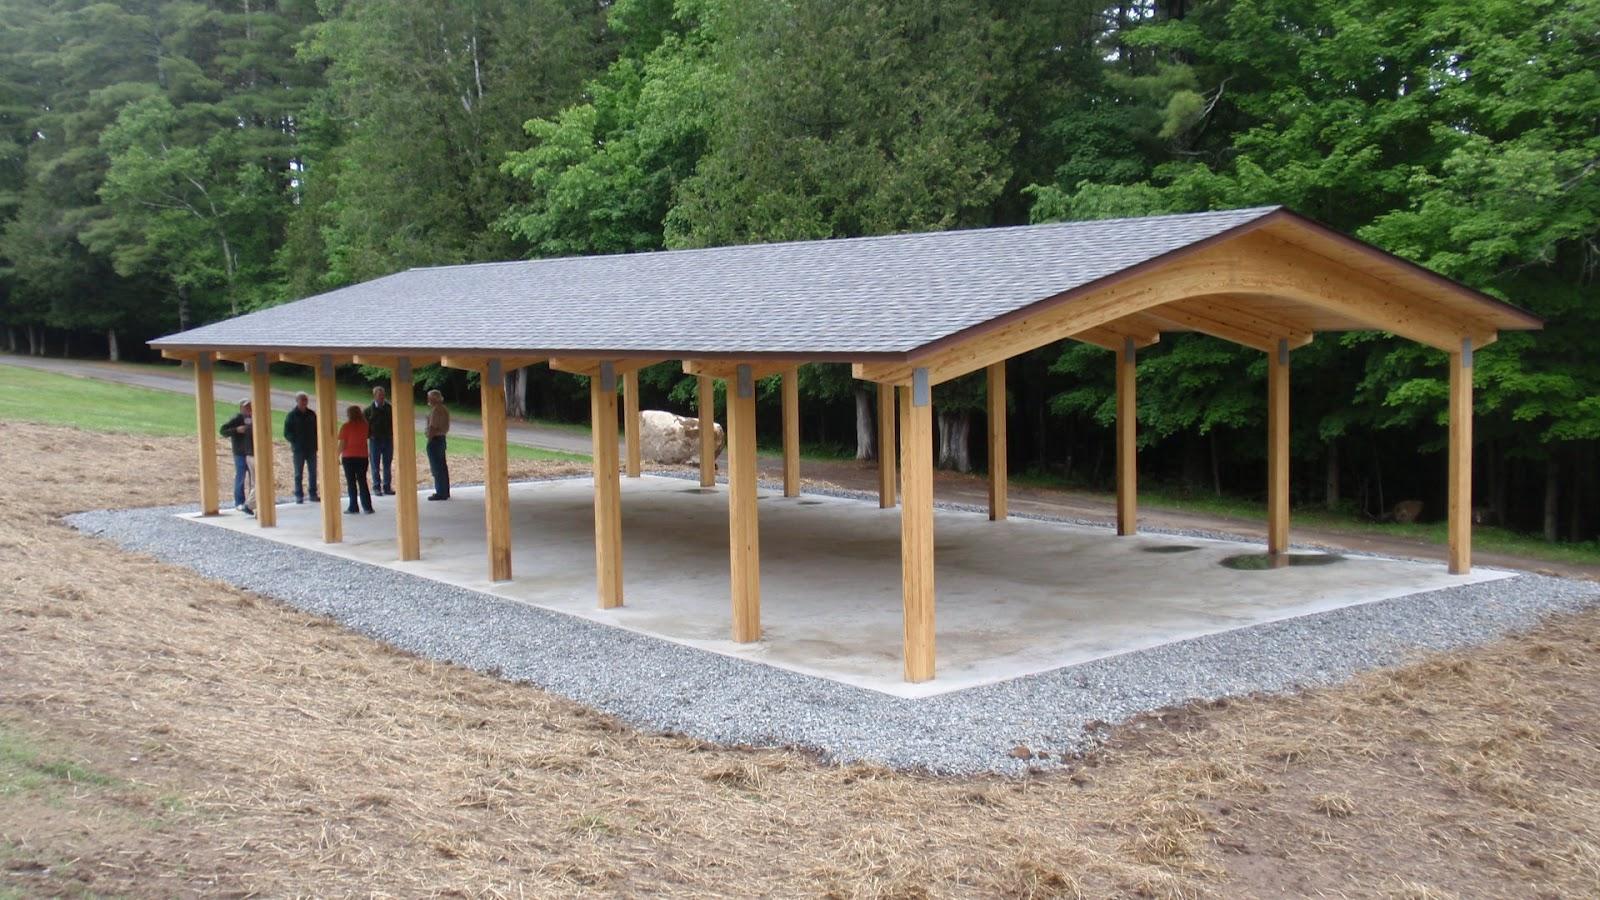 Wood Picnic Shelter : New picnic shelter wood times